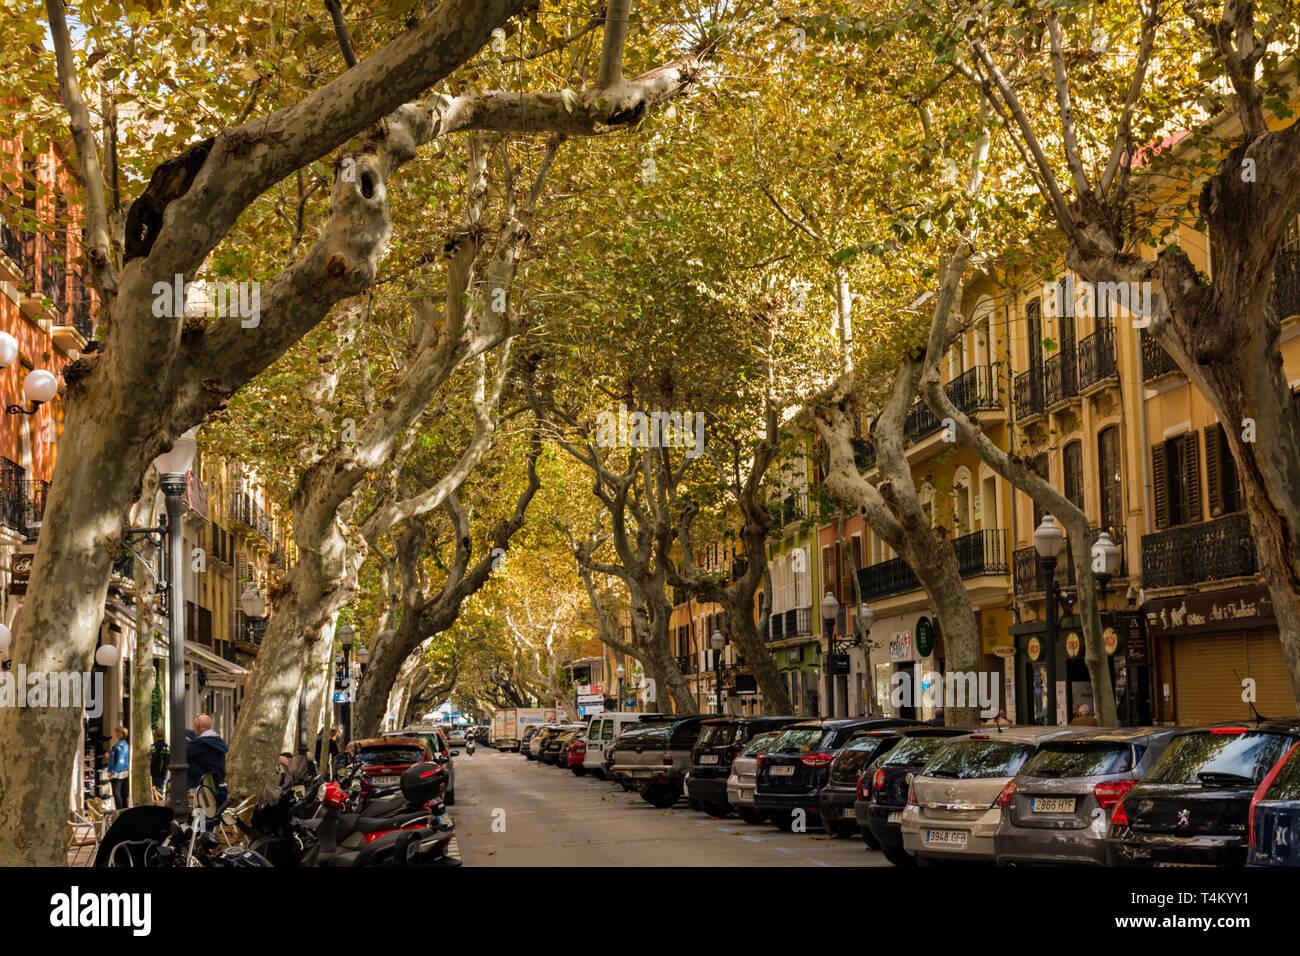 Dénia, Alicante, Espagne, le 21 novembre 2018: Marques de Campo Street, rue principale. La rue commerciale Banque D'Images